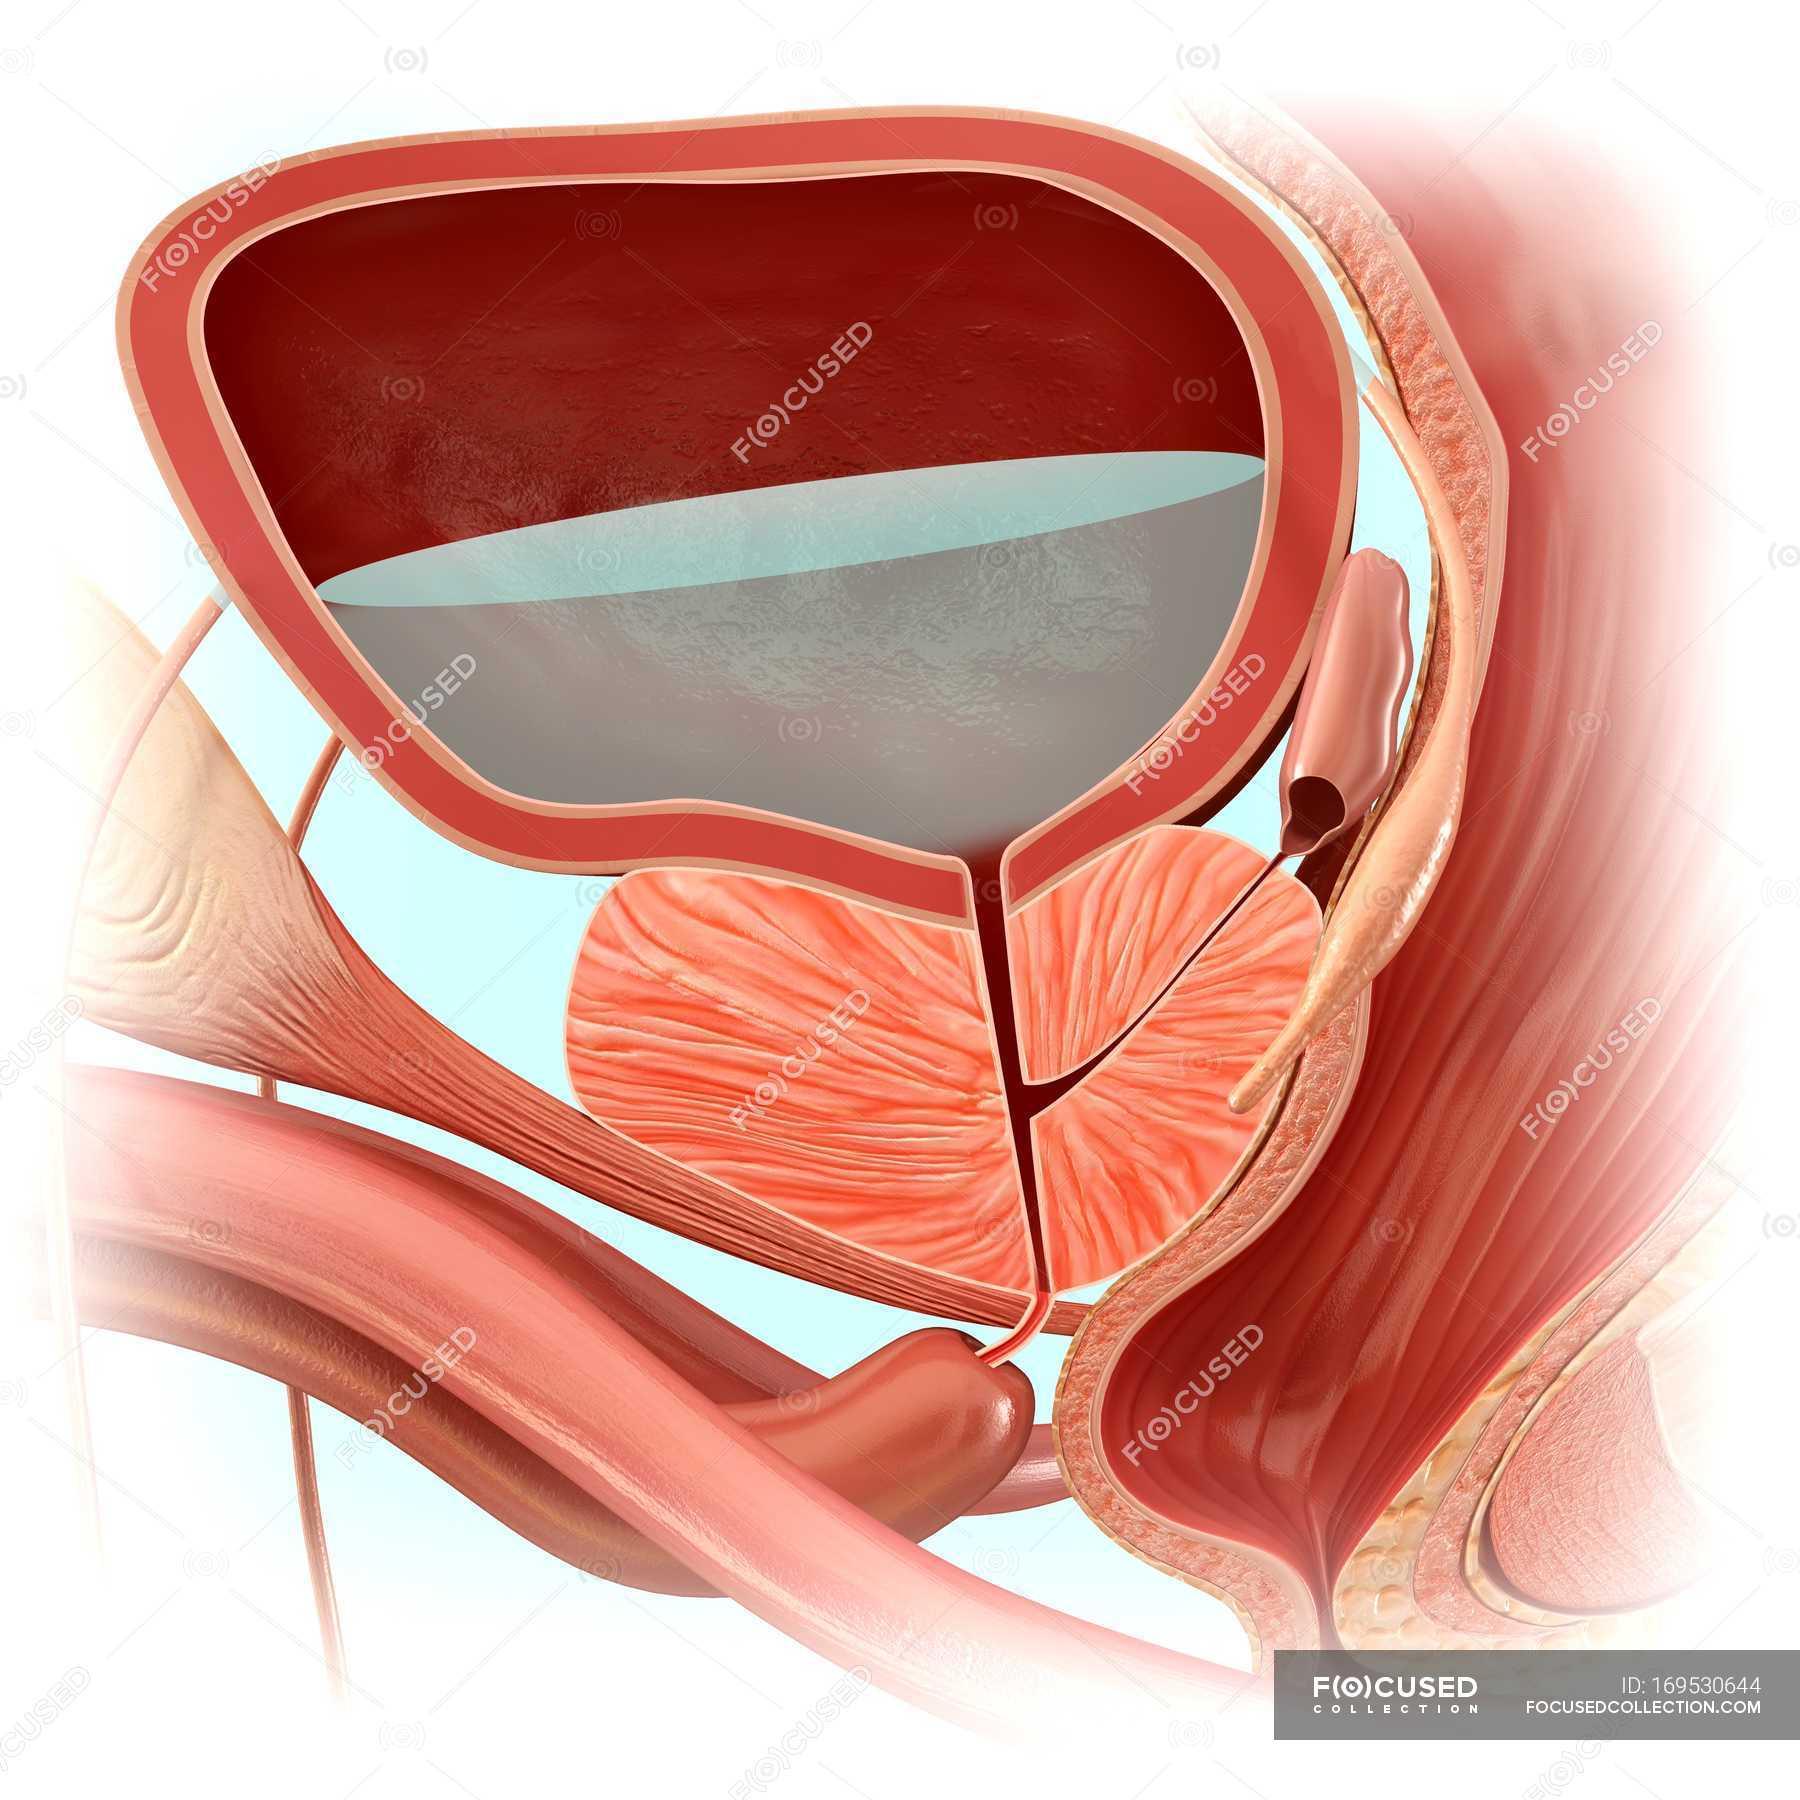 Male bladder anatomy — Stock Photo | #169530644